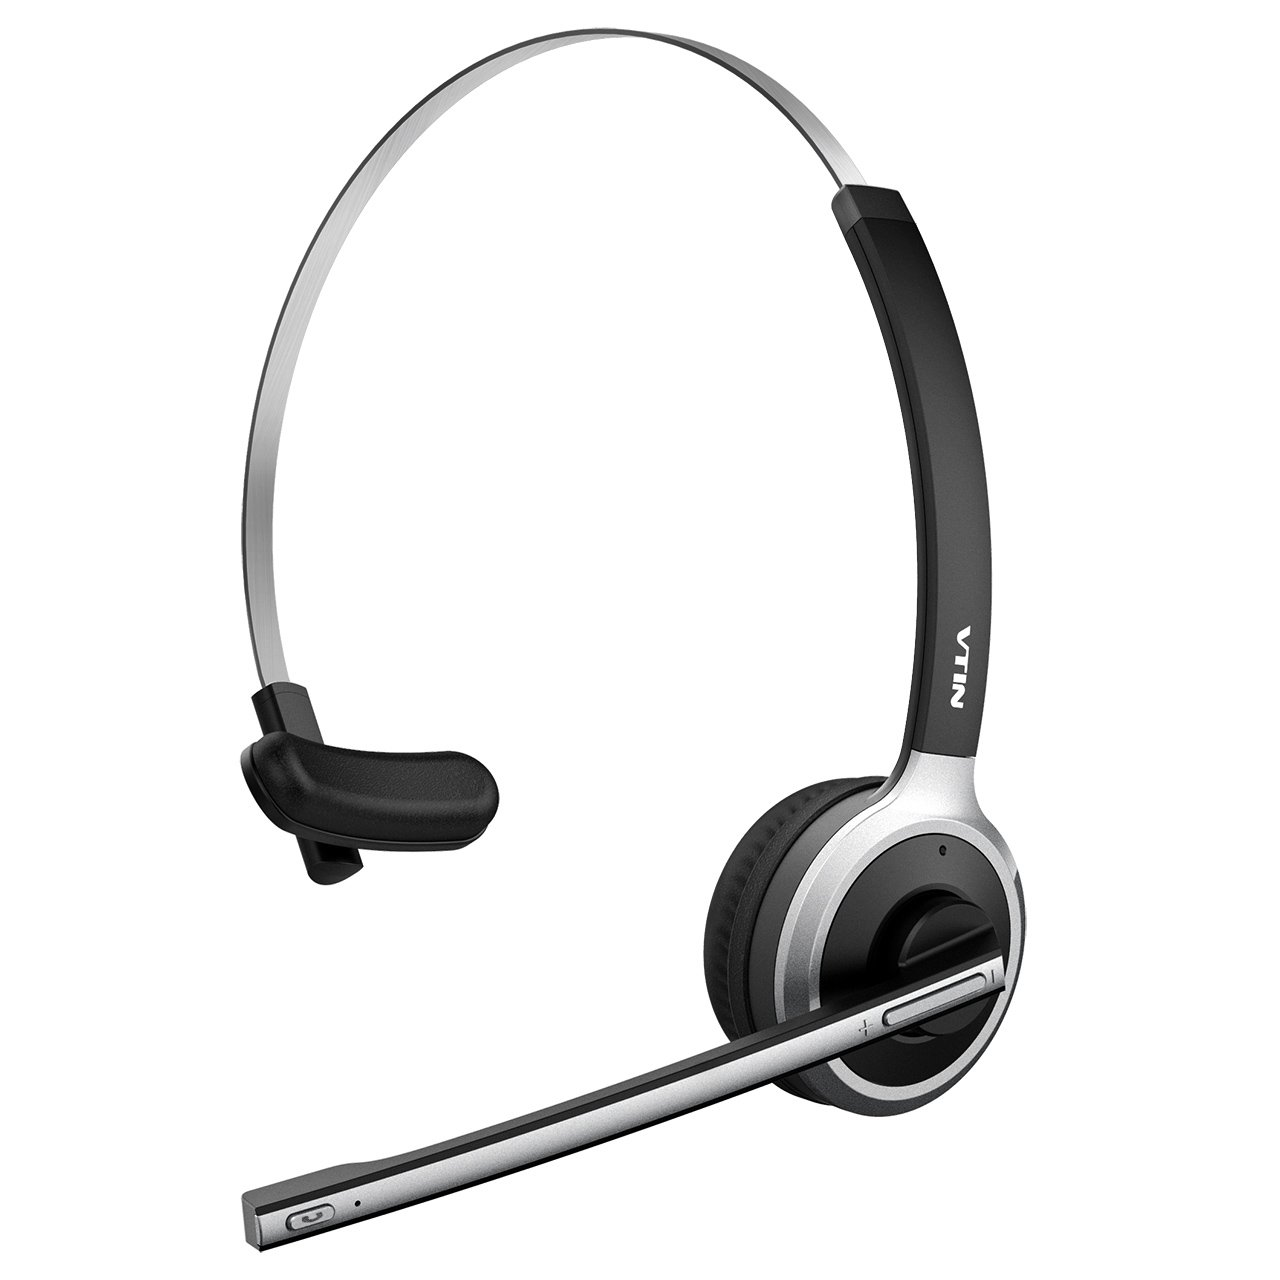 VTIN Chat Headset, Wireless Headset Bluetooth headset Headset mit Mikrofon, Freisprechfunktion, Rauschunterdrü cku, Headset on Ear, Headphone fü r PC,Computer, Handy, VoIP, Skype, Bü ro, LKW, Auto usw VTVNBH078AB-DE1